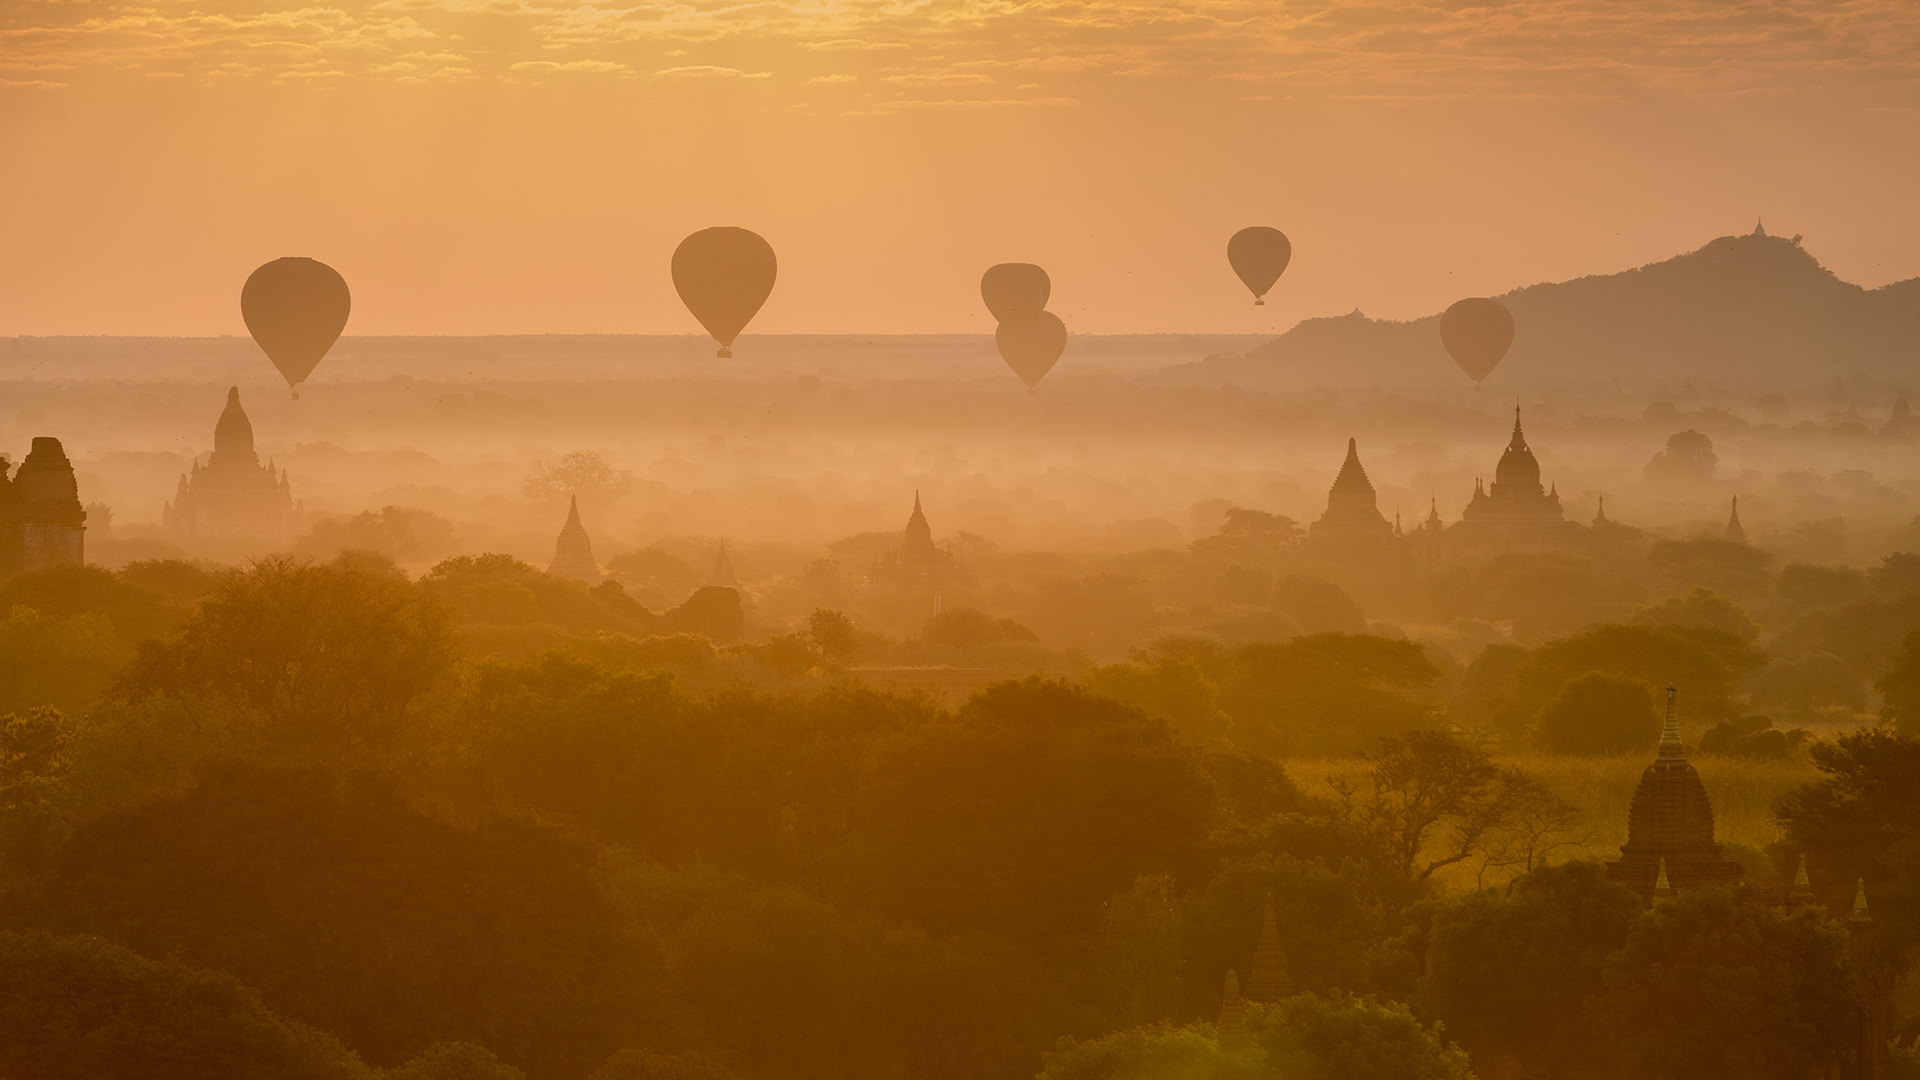 Królestwo Pagan, Mjanma - fot. Tomasz Stolz